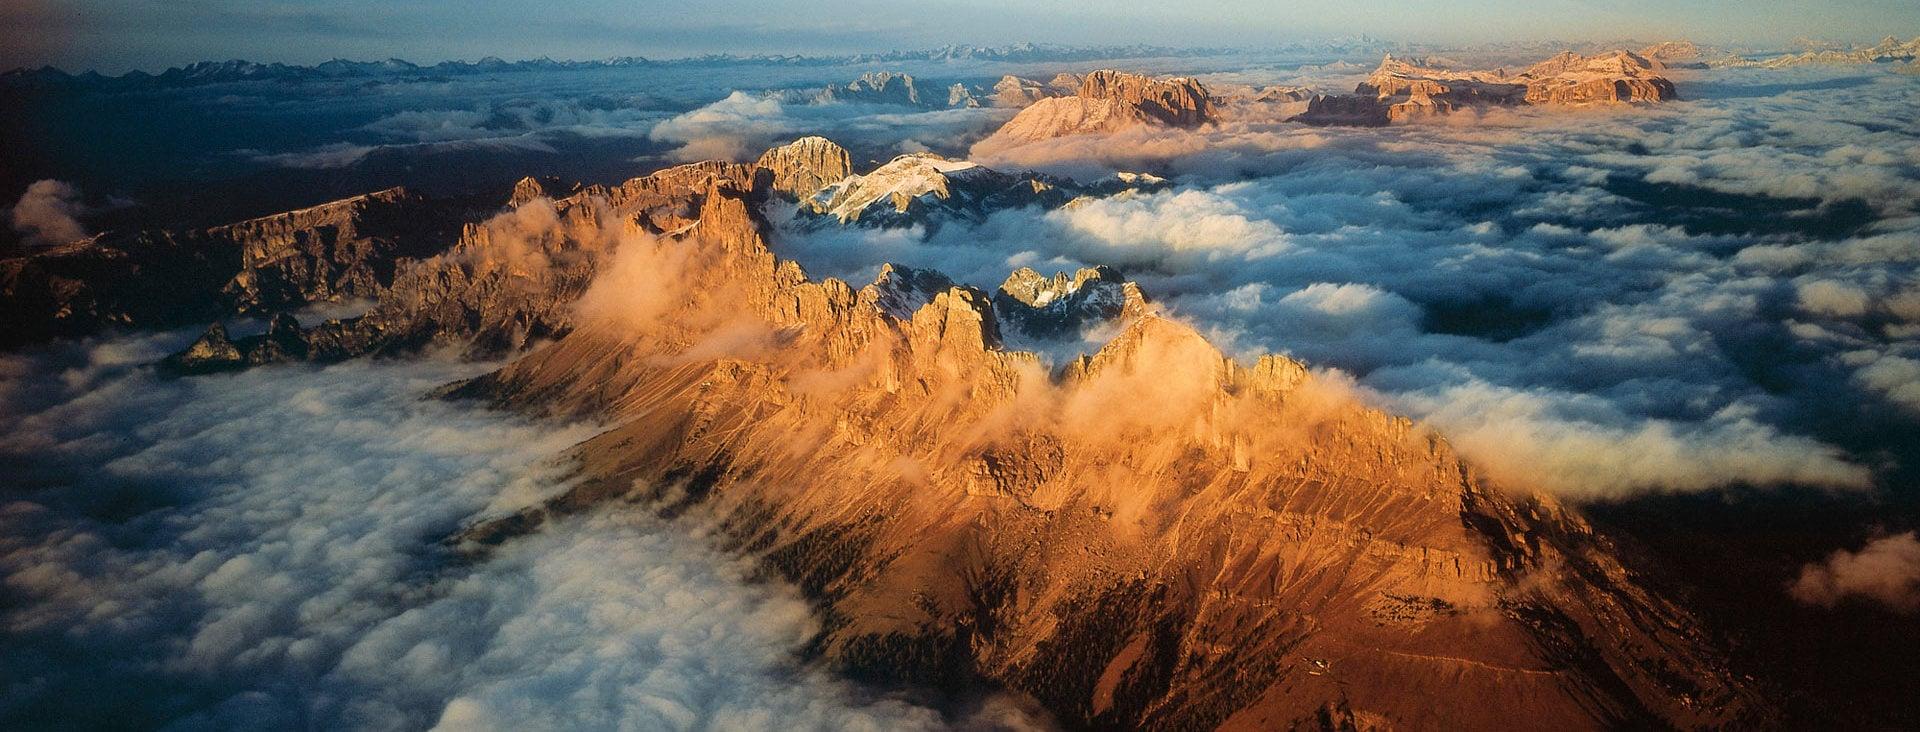 Karersee Dolomiten